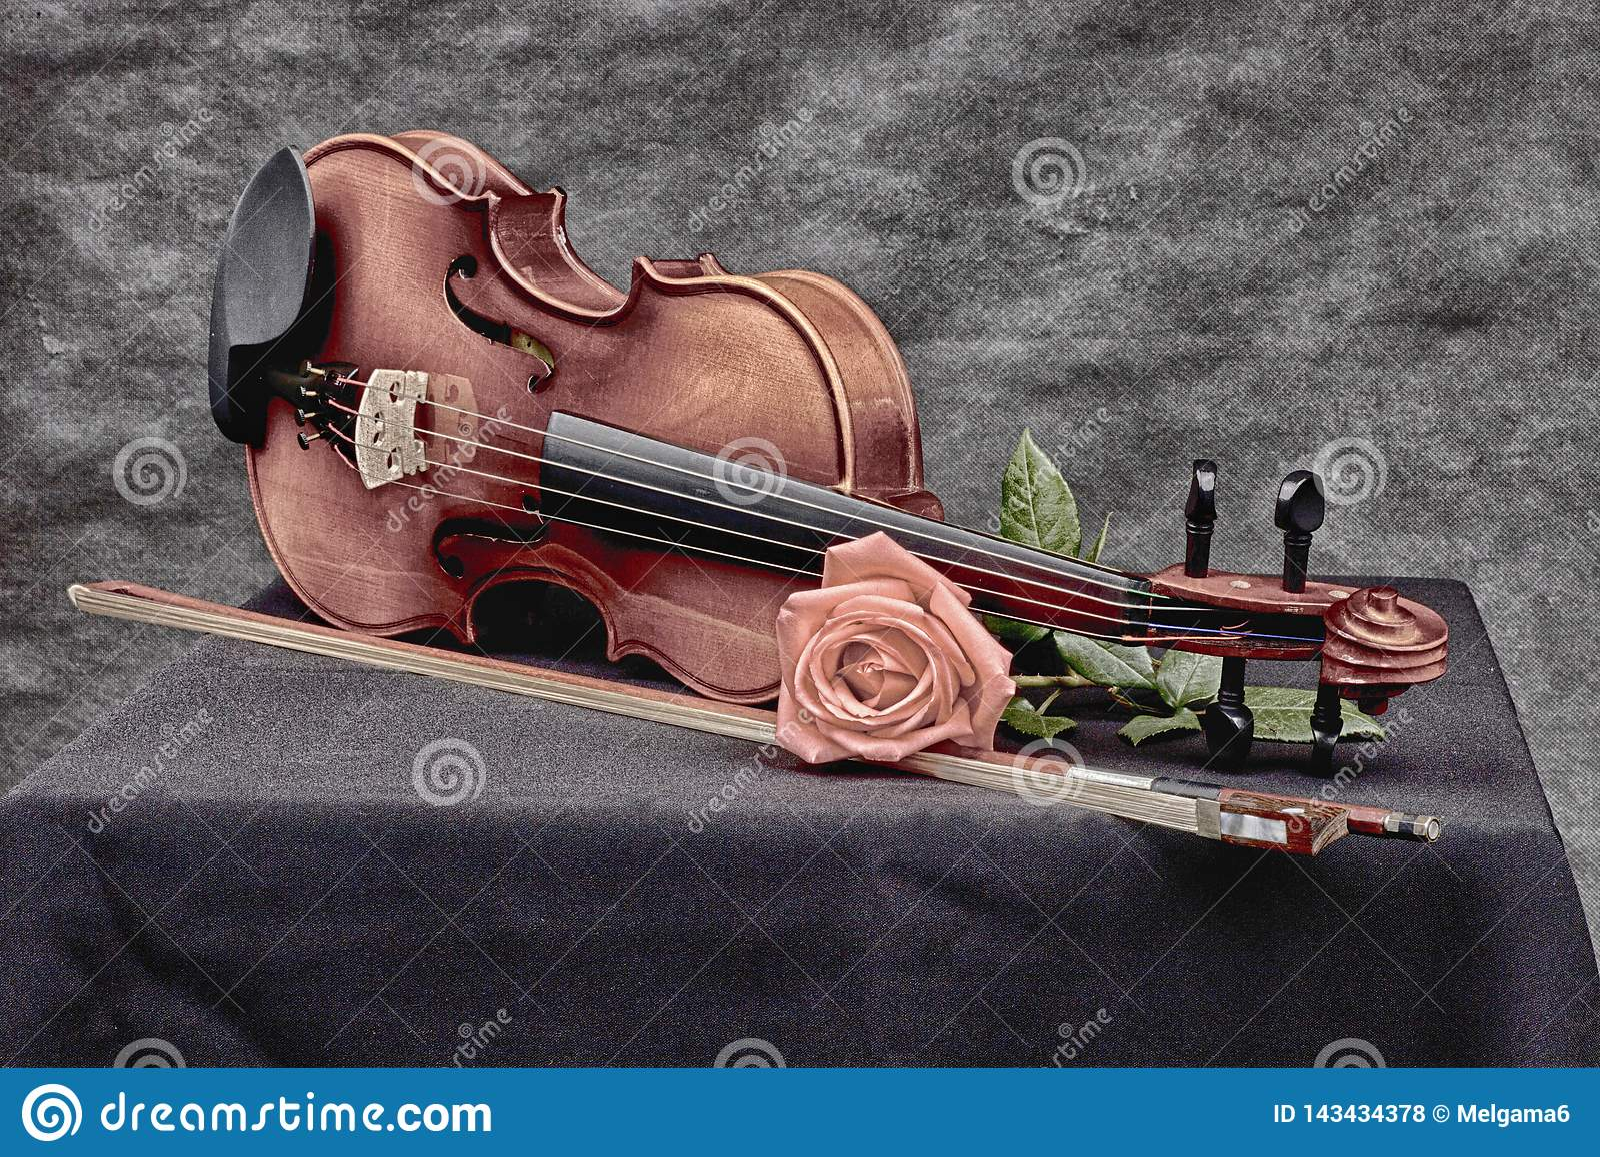 Violin in artistic mood